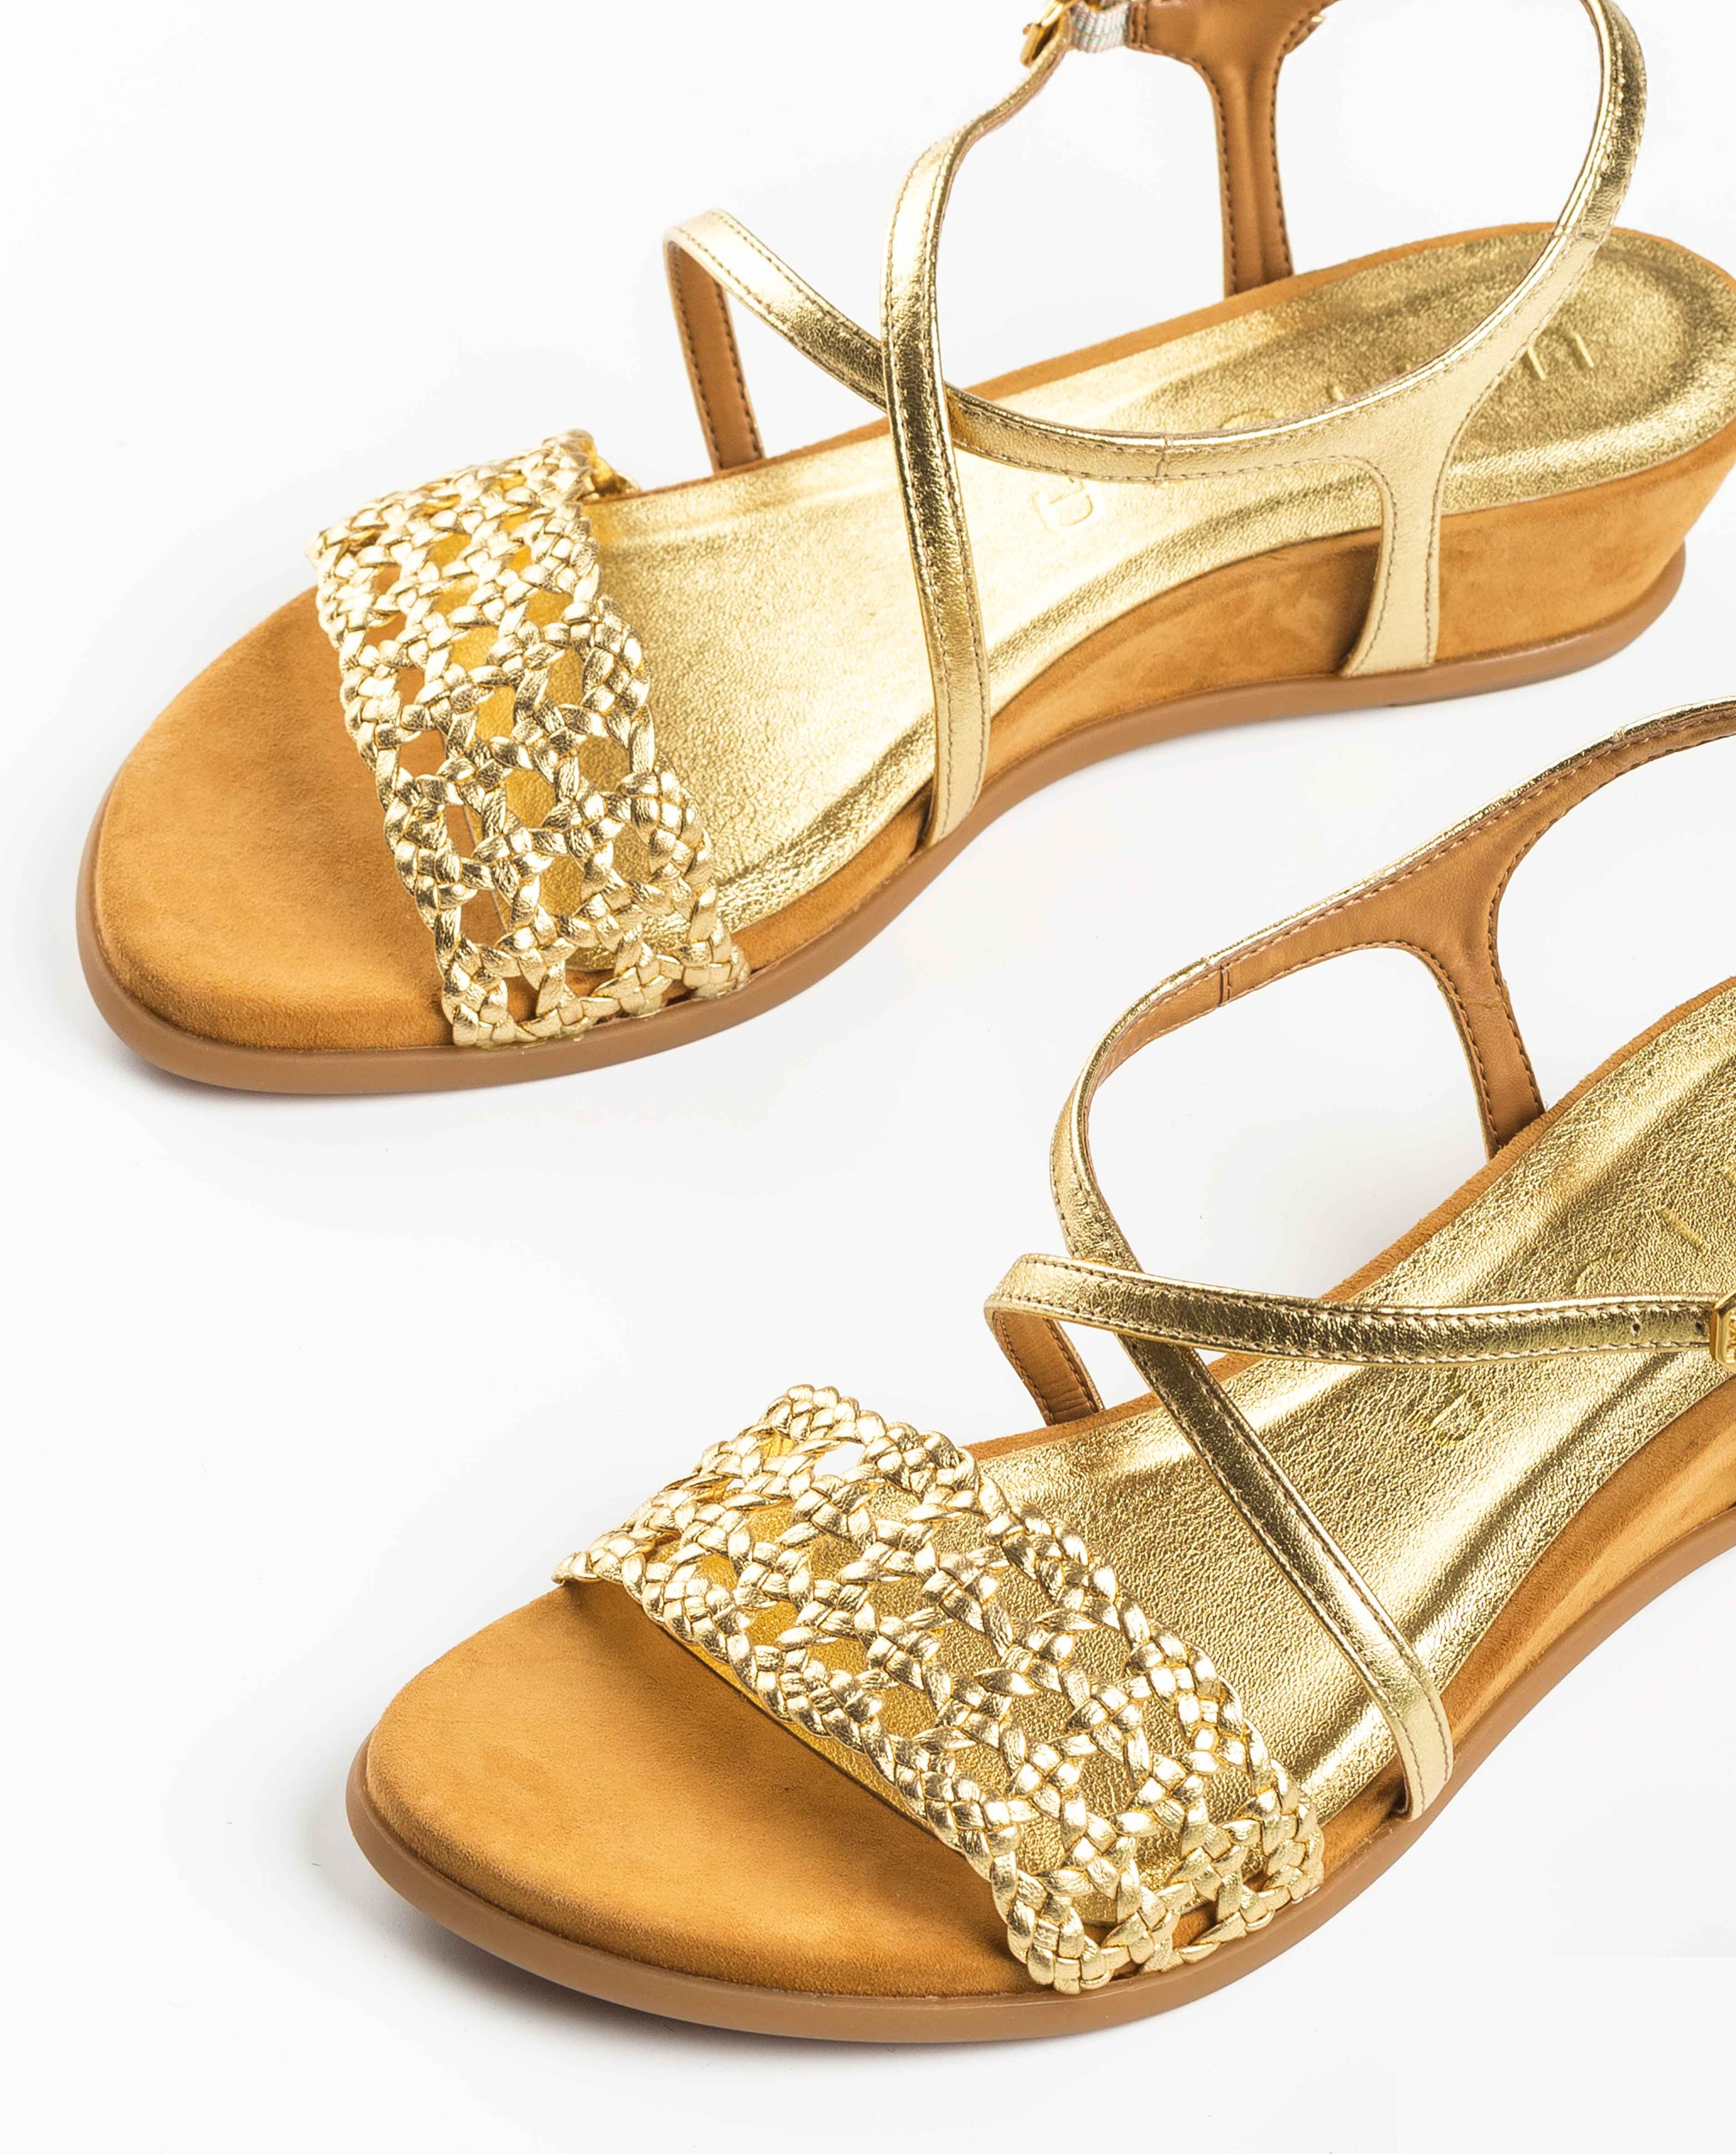 UNISA Sandalia metalizada macramé BENSON_LMT gold